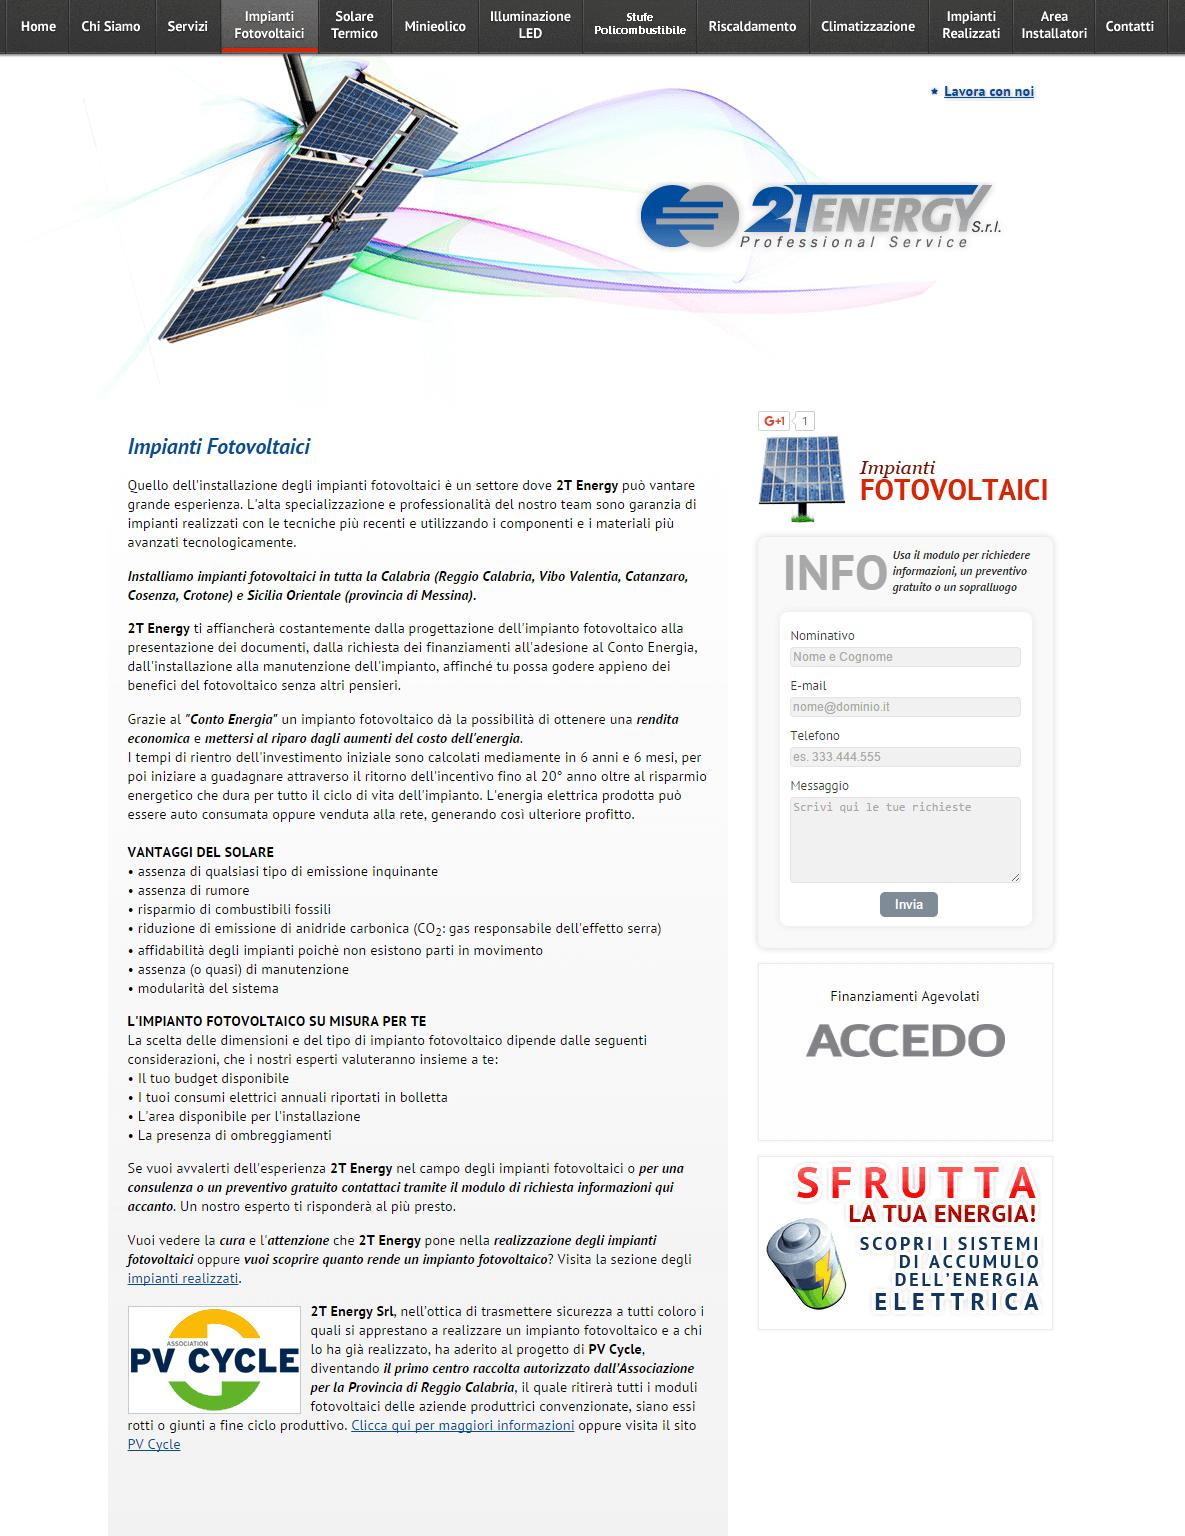 2T Energy Pagina Impianti Fotovoltaici